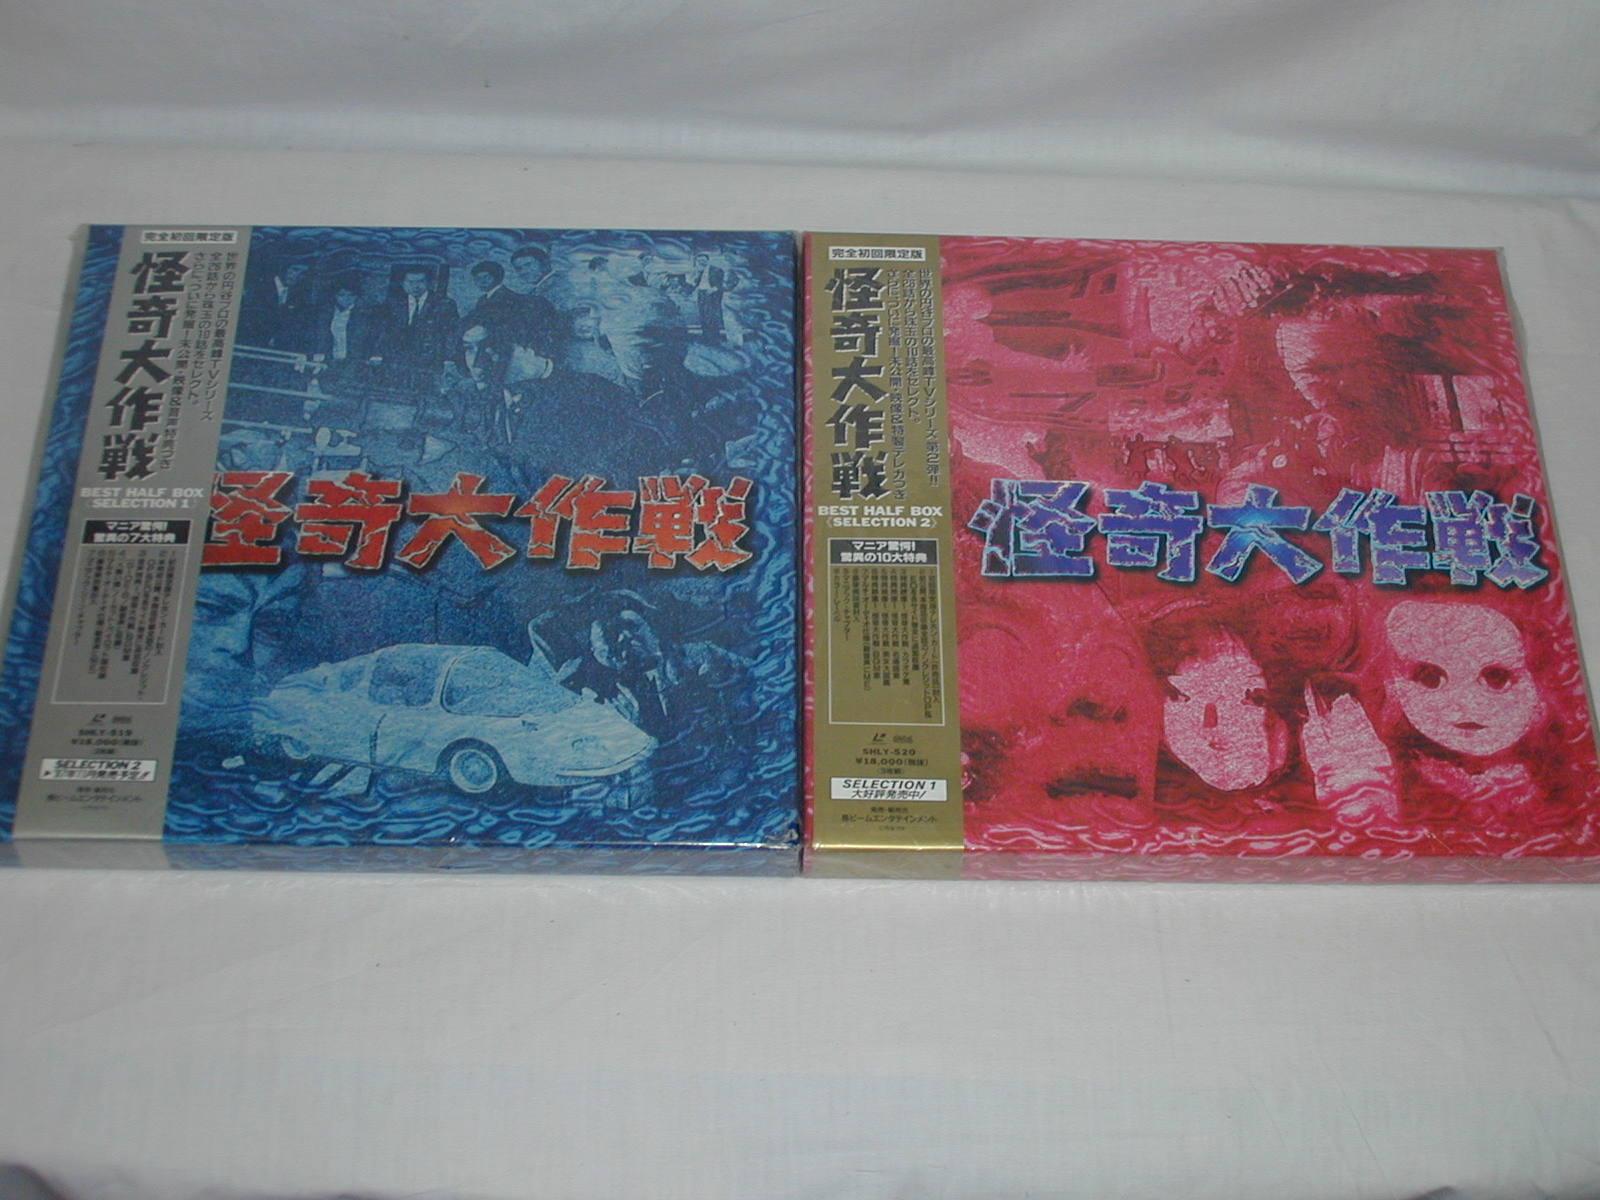 (LD)怪奇大作戦 BEST HARF BOX SELECTION1、 2 全2BOXセット